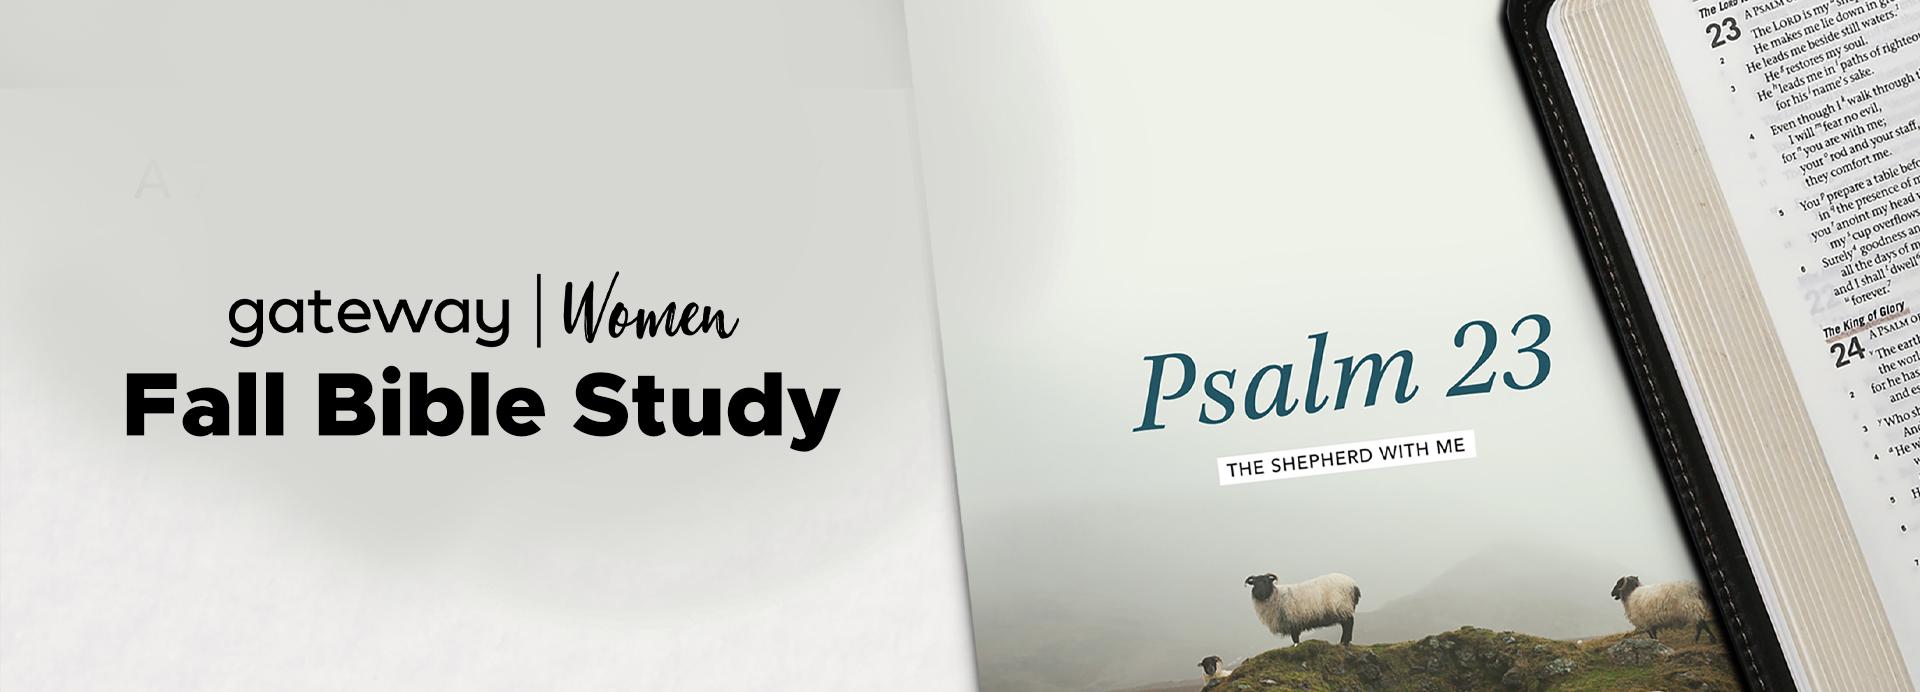 bible study_banner.jpg